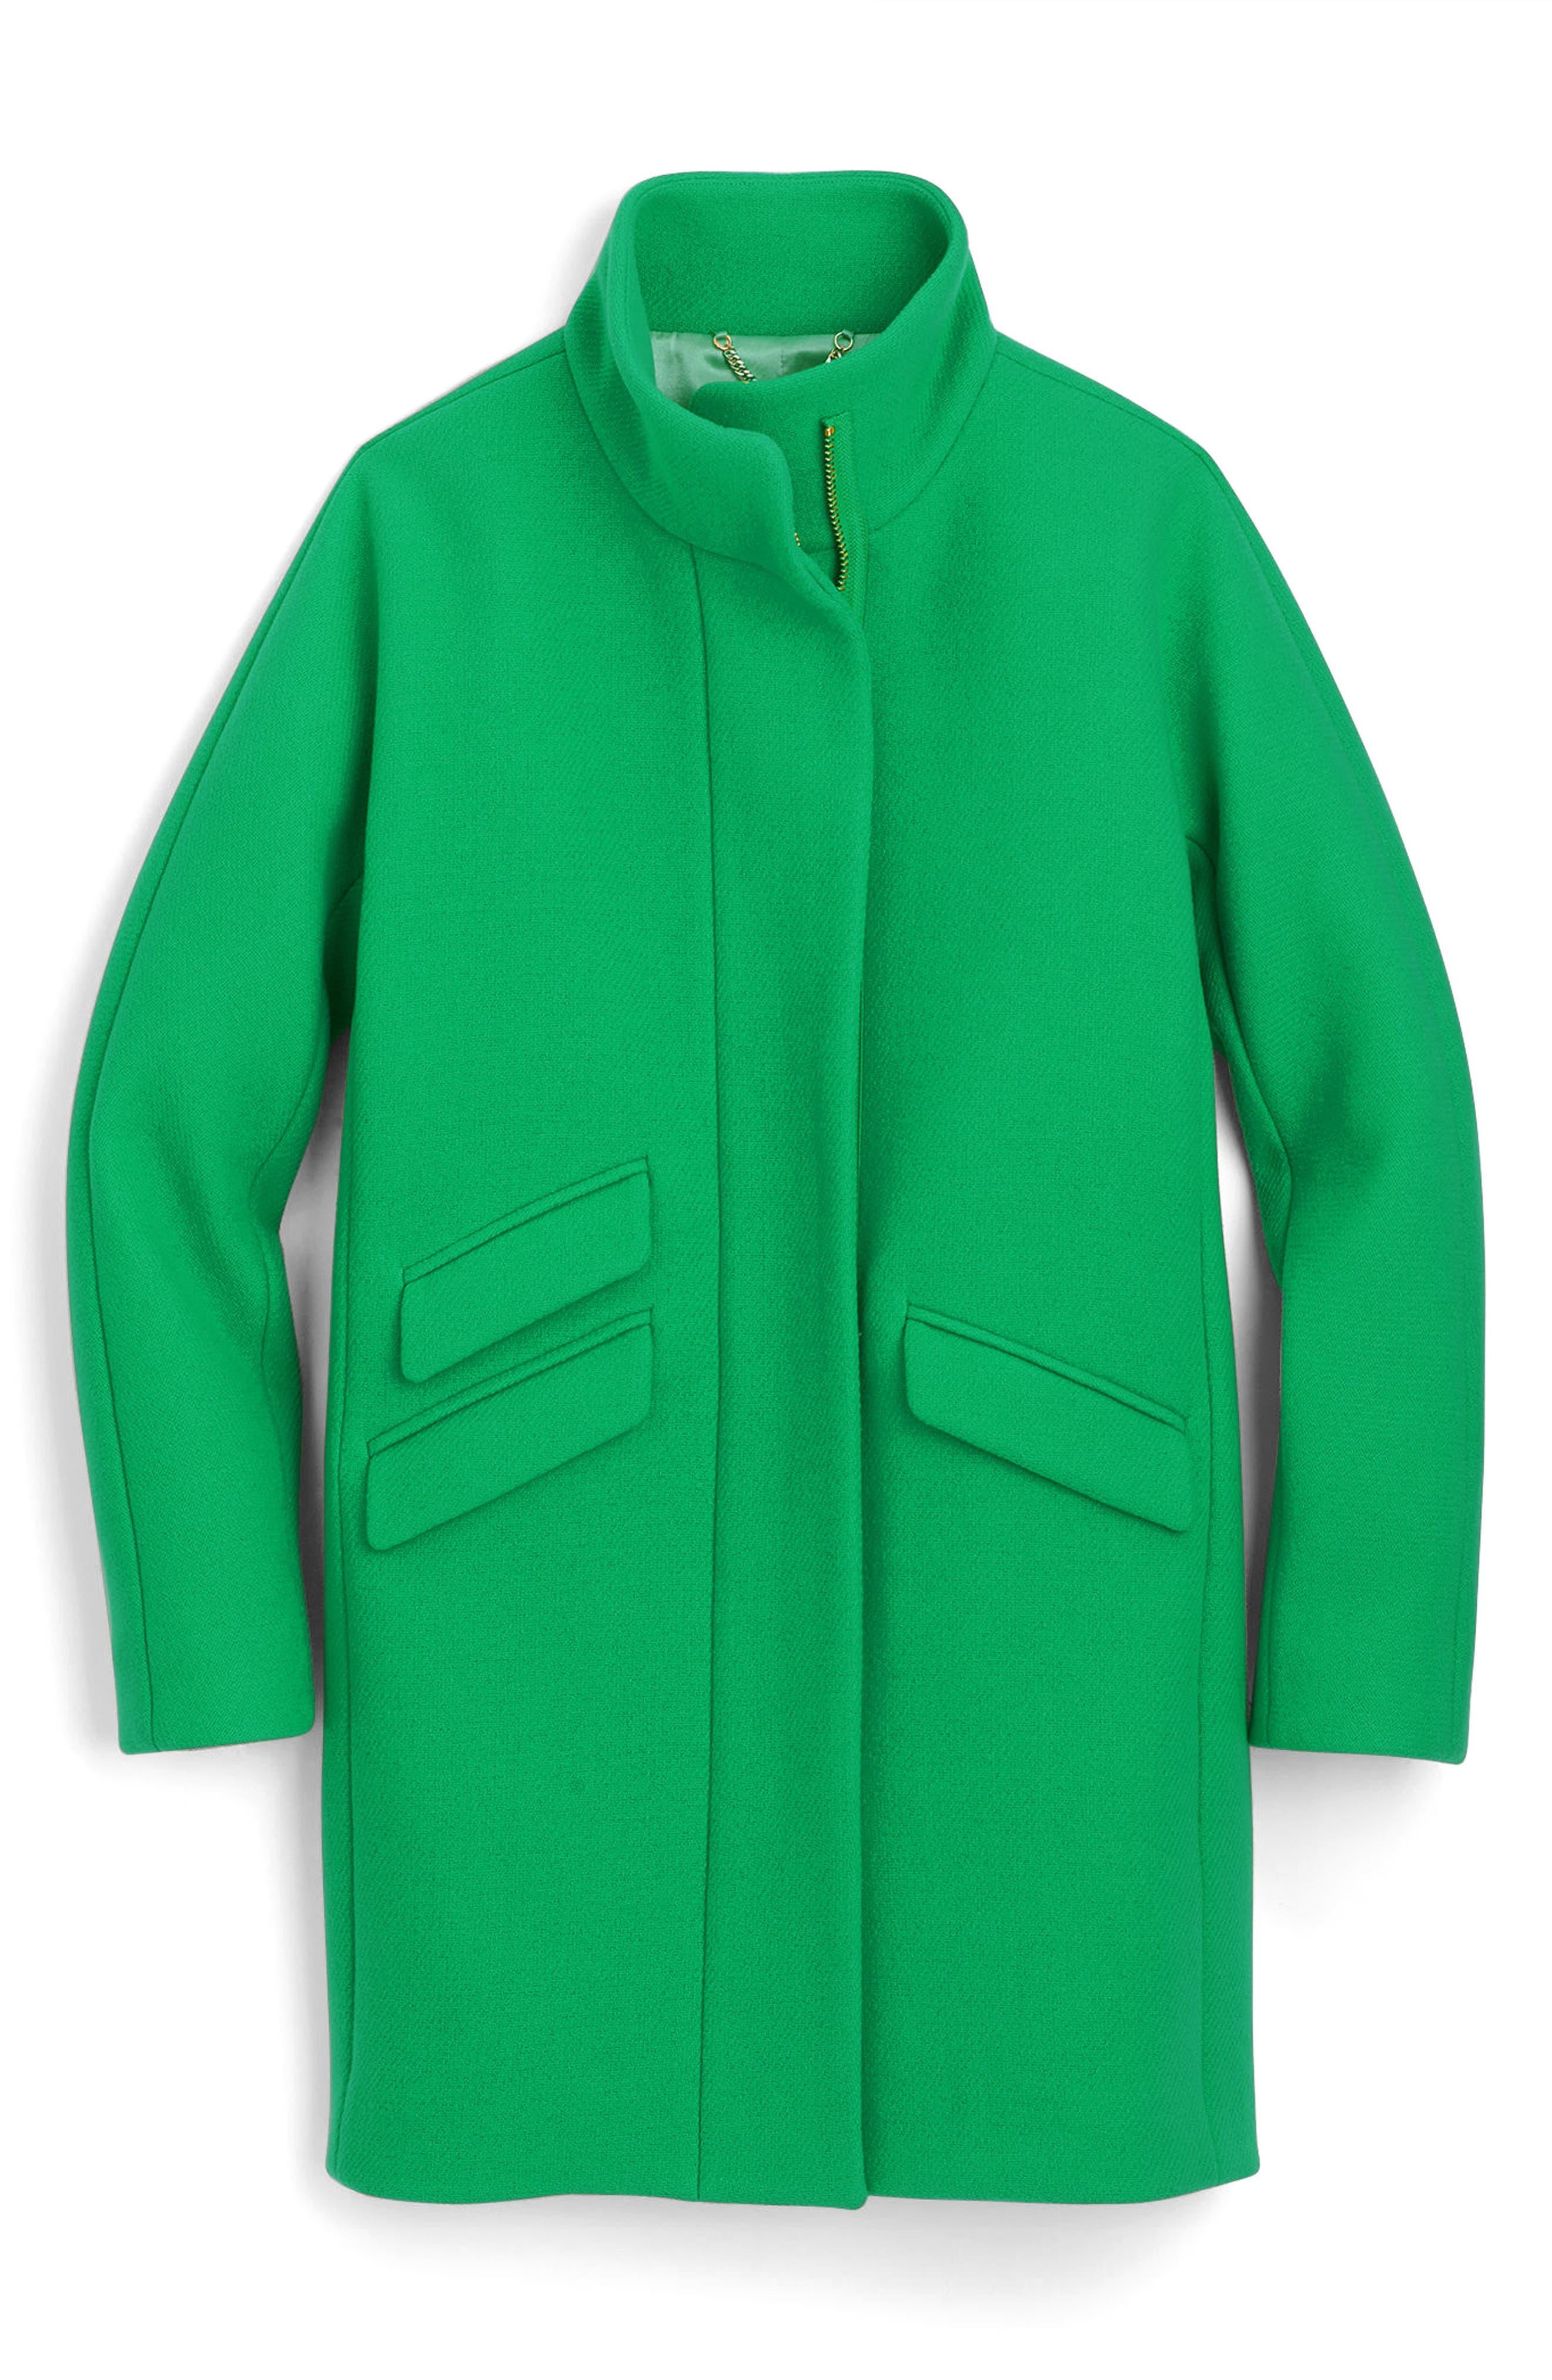 Alternate Image 1 Selected - J.Crew Stadium Cloth Cocoon Coat (Regular & Petite)